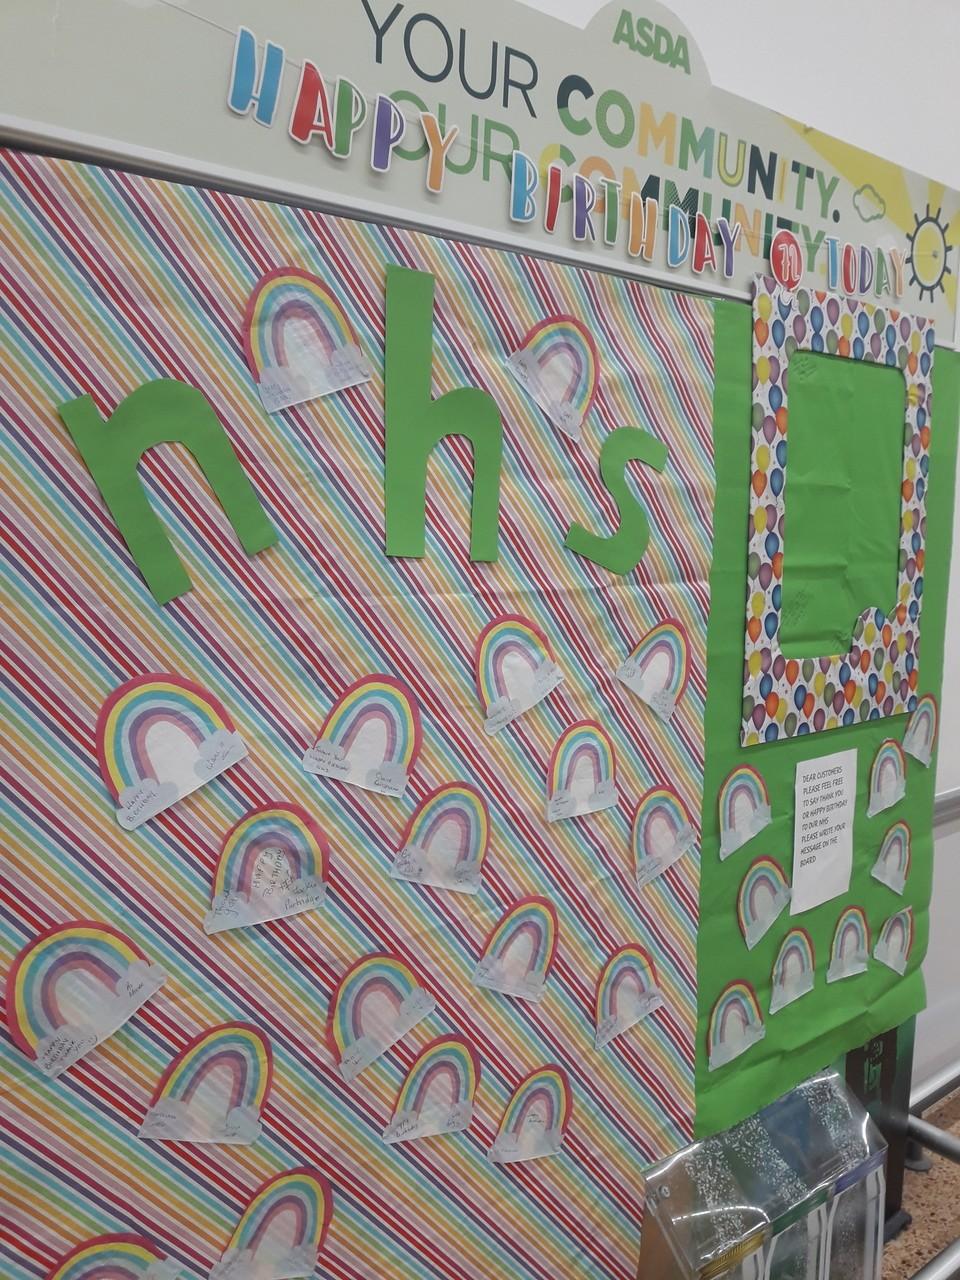 NHS 72nd birthday wall | Asda Harpurhey